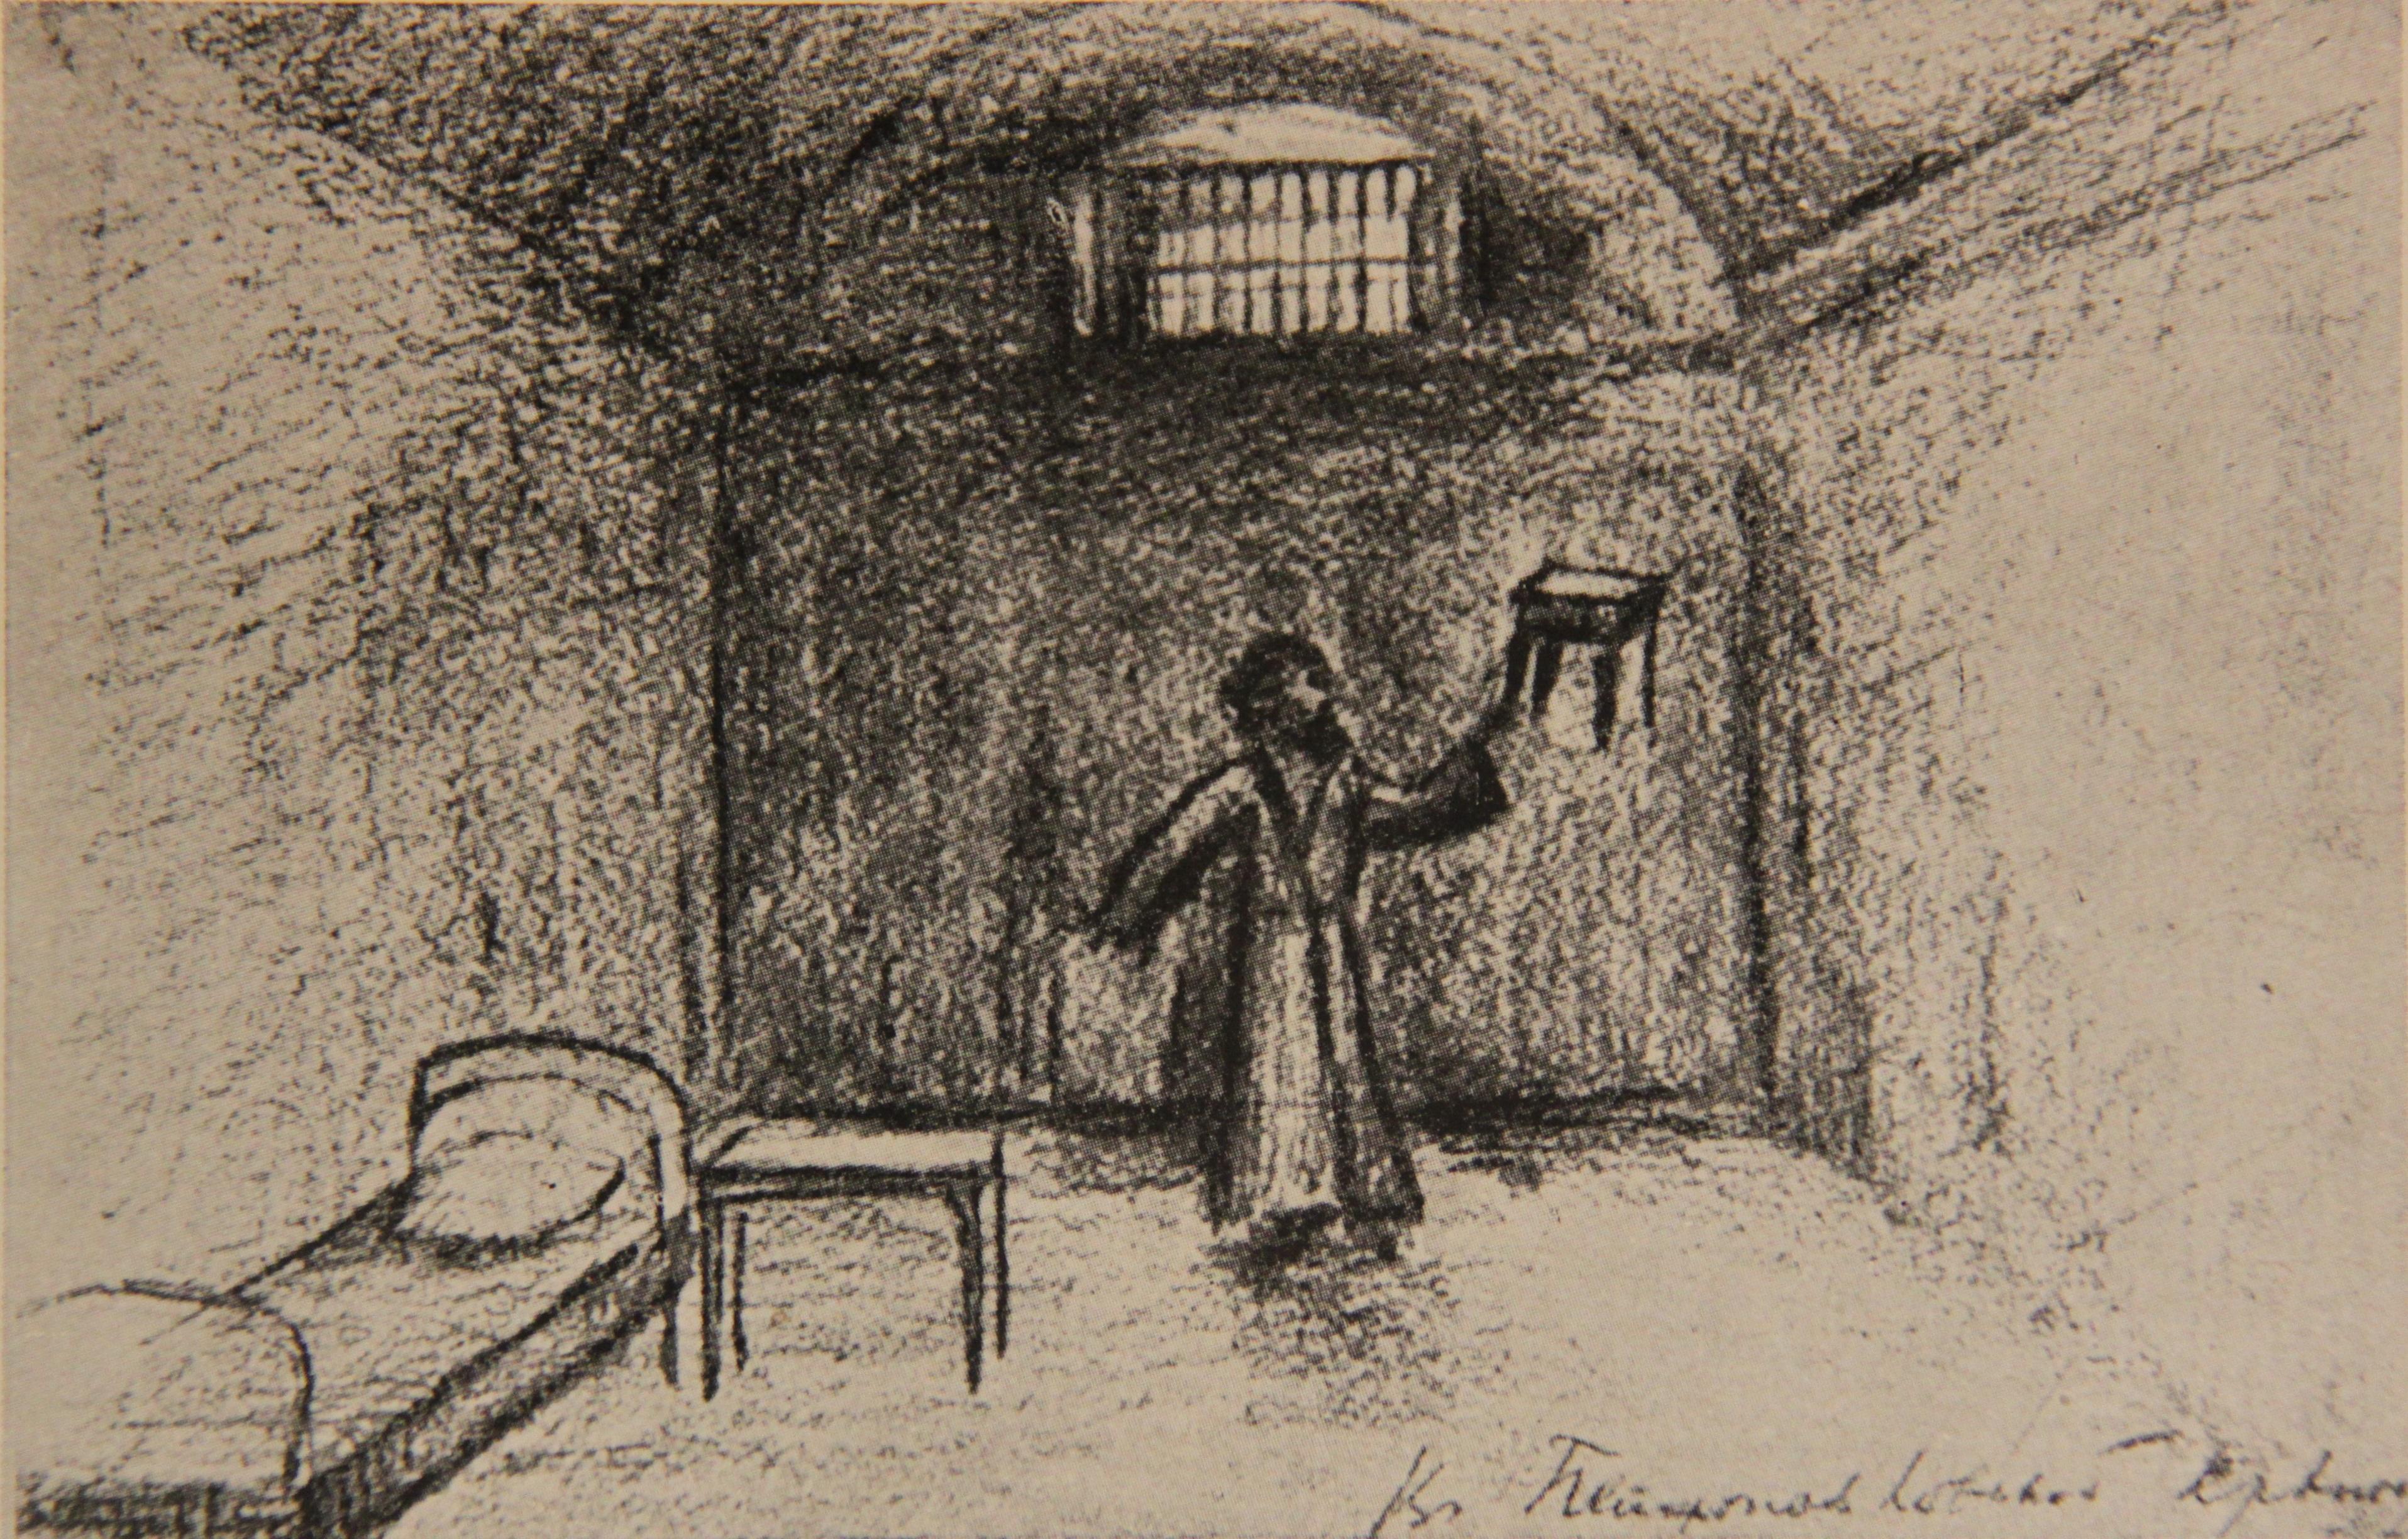 П.А.Кропоткин в каземате Петропавловской крепости (рисунок карандашом П.А.Кропоткина)